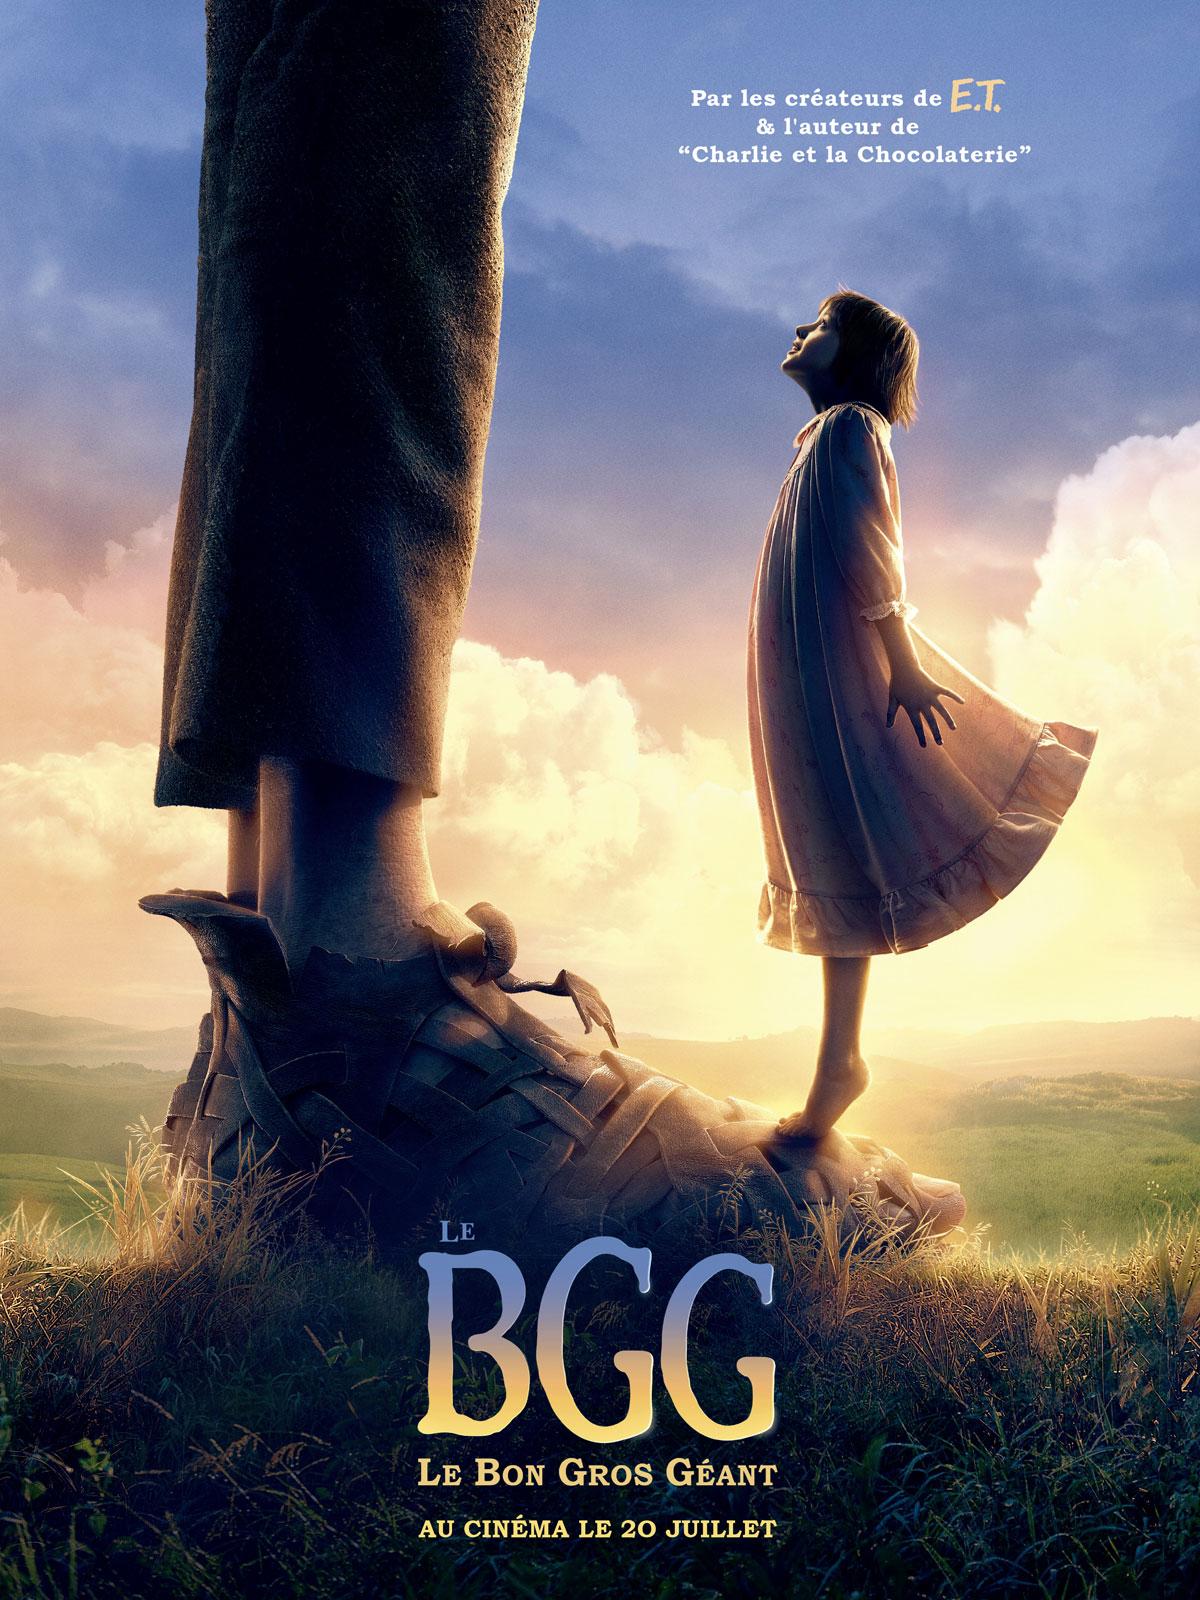 bgg-film